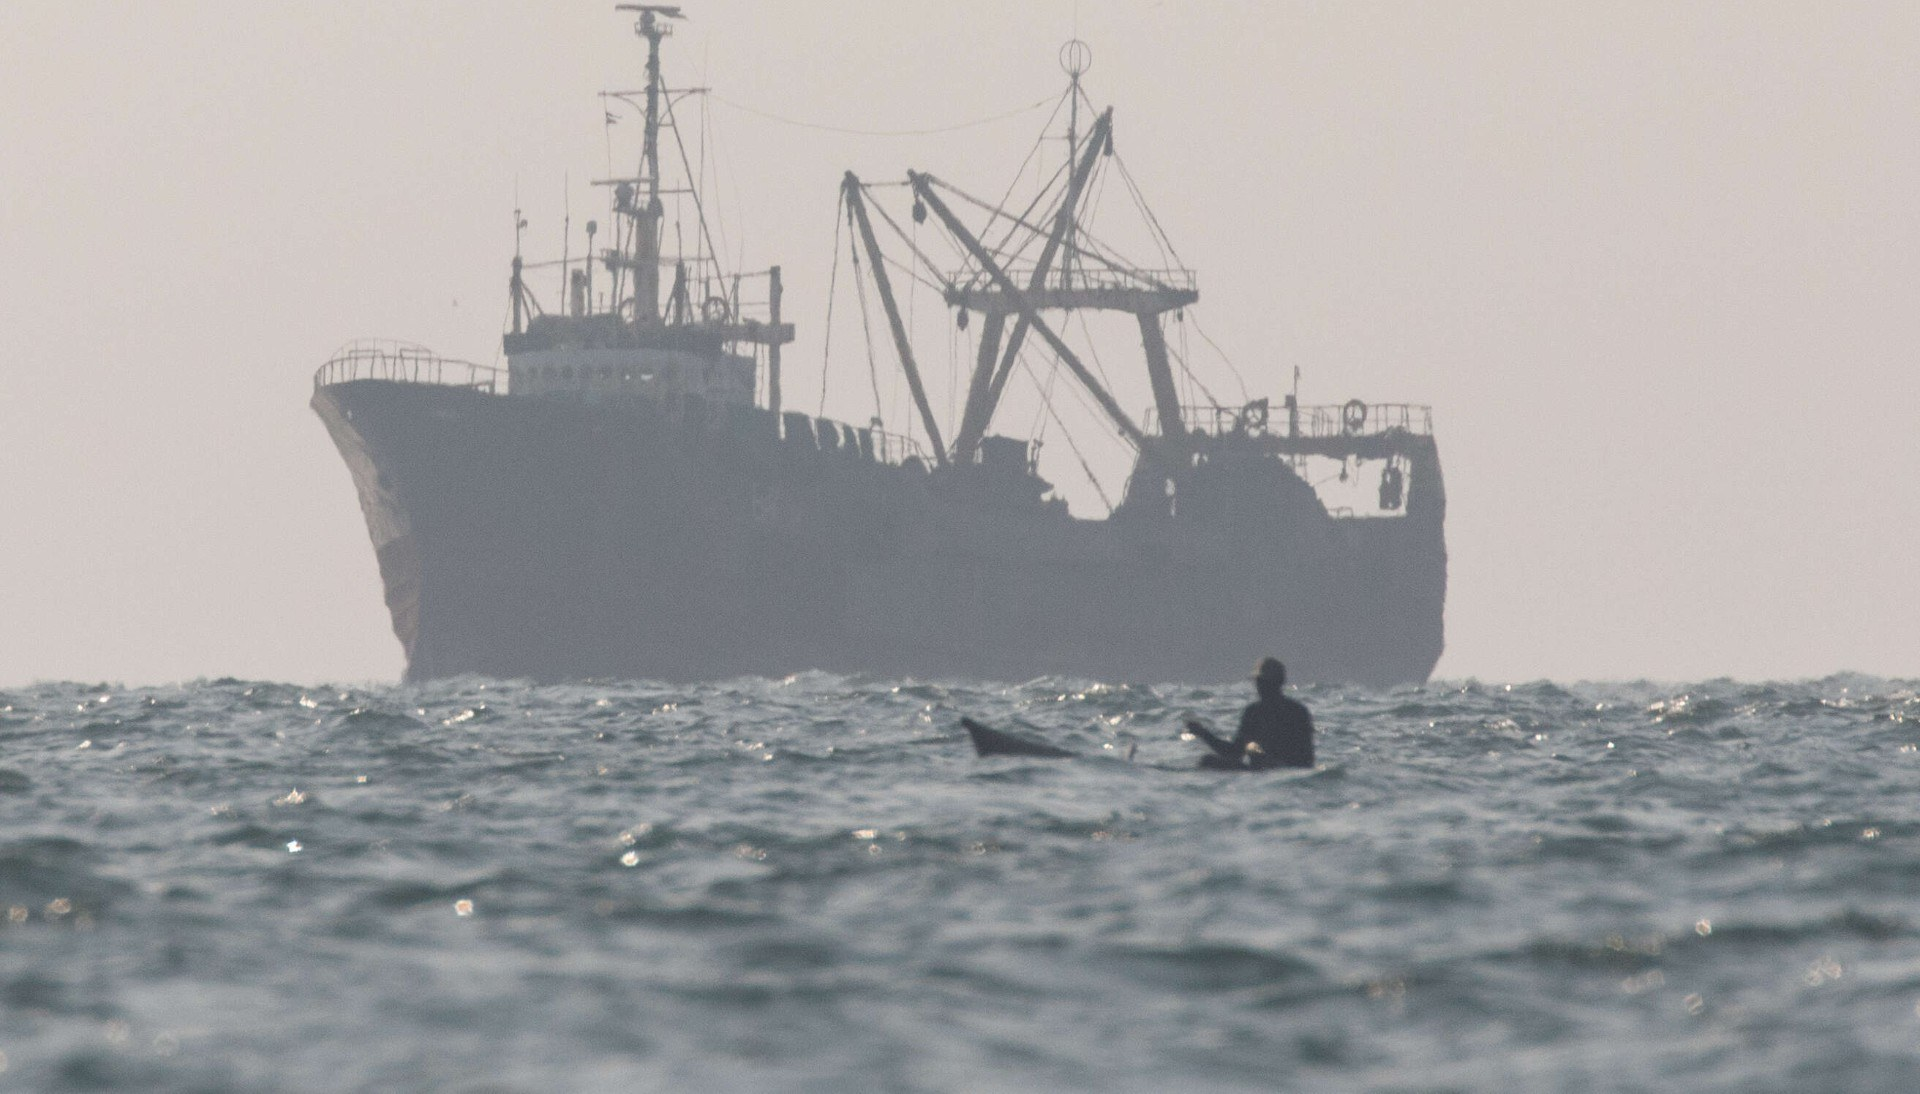 How to eradicate illegal fishing